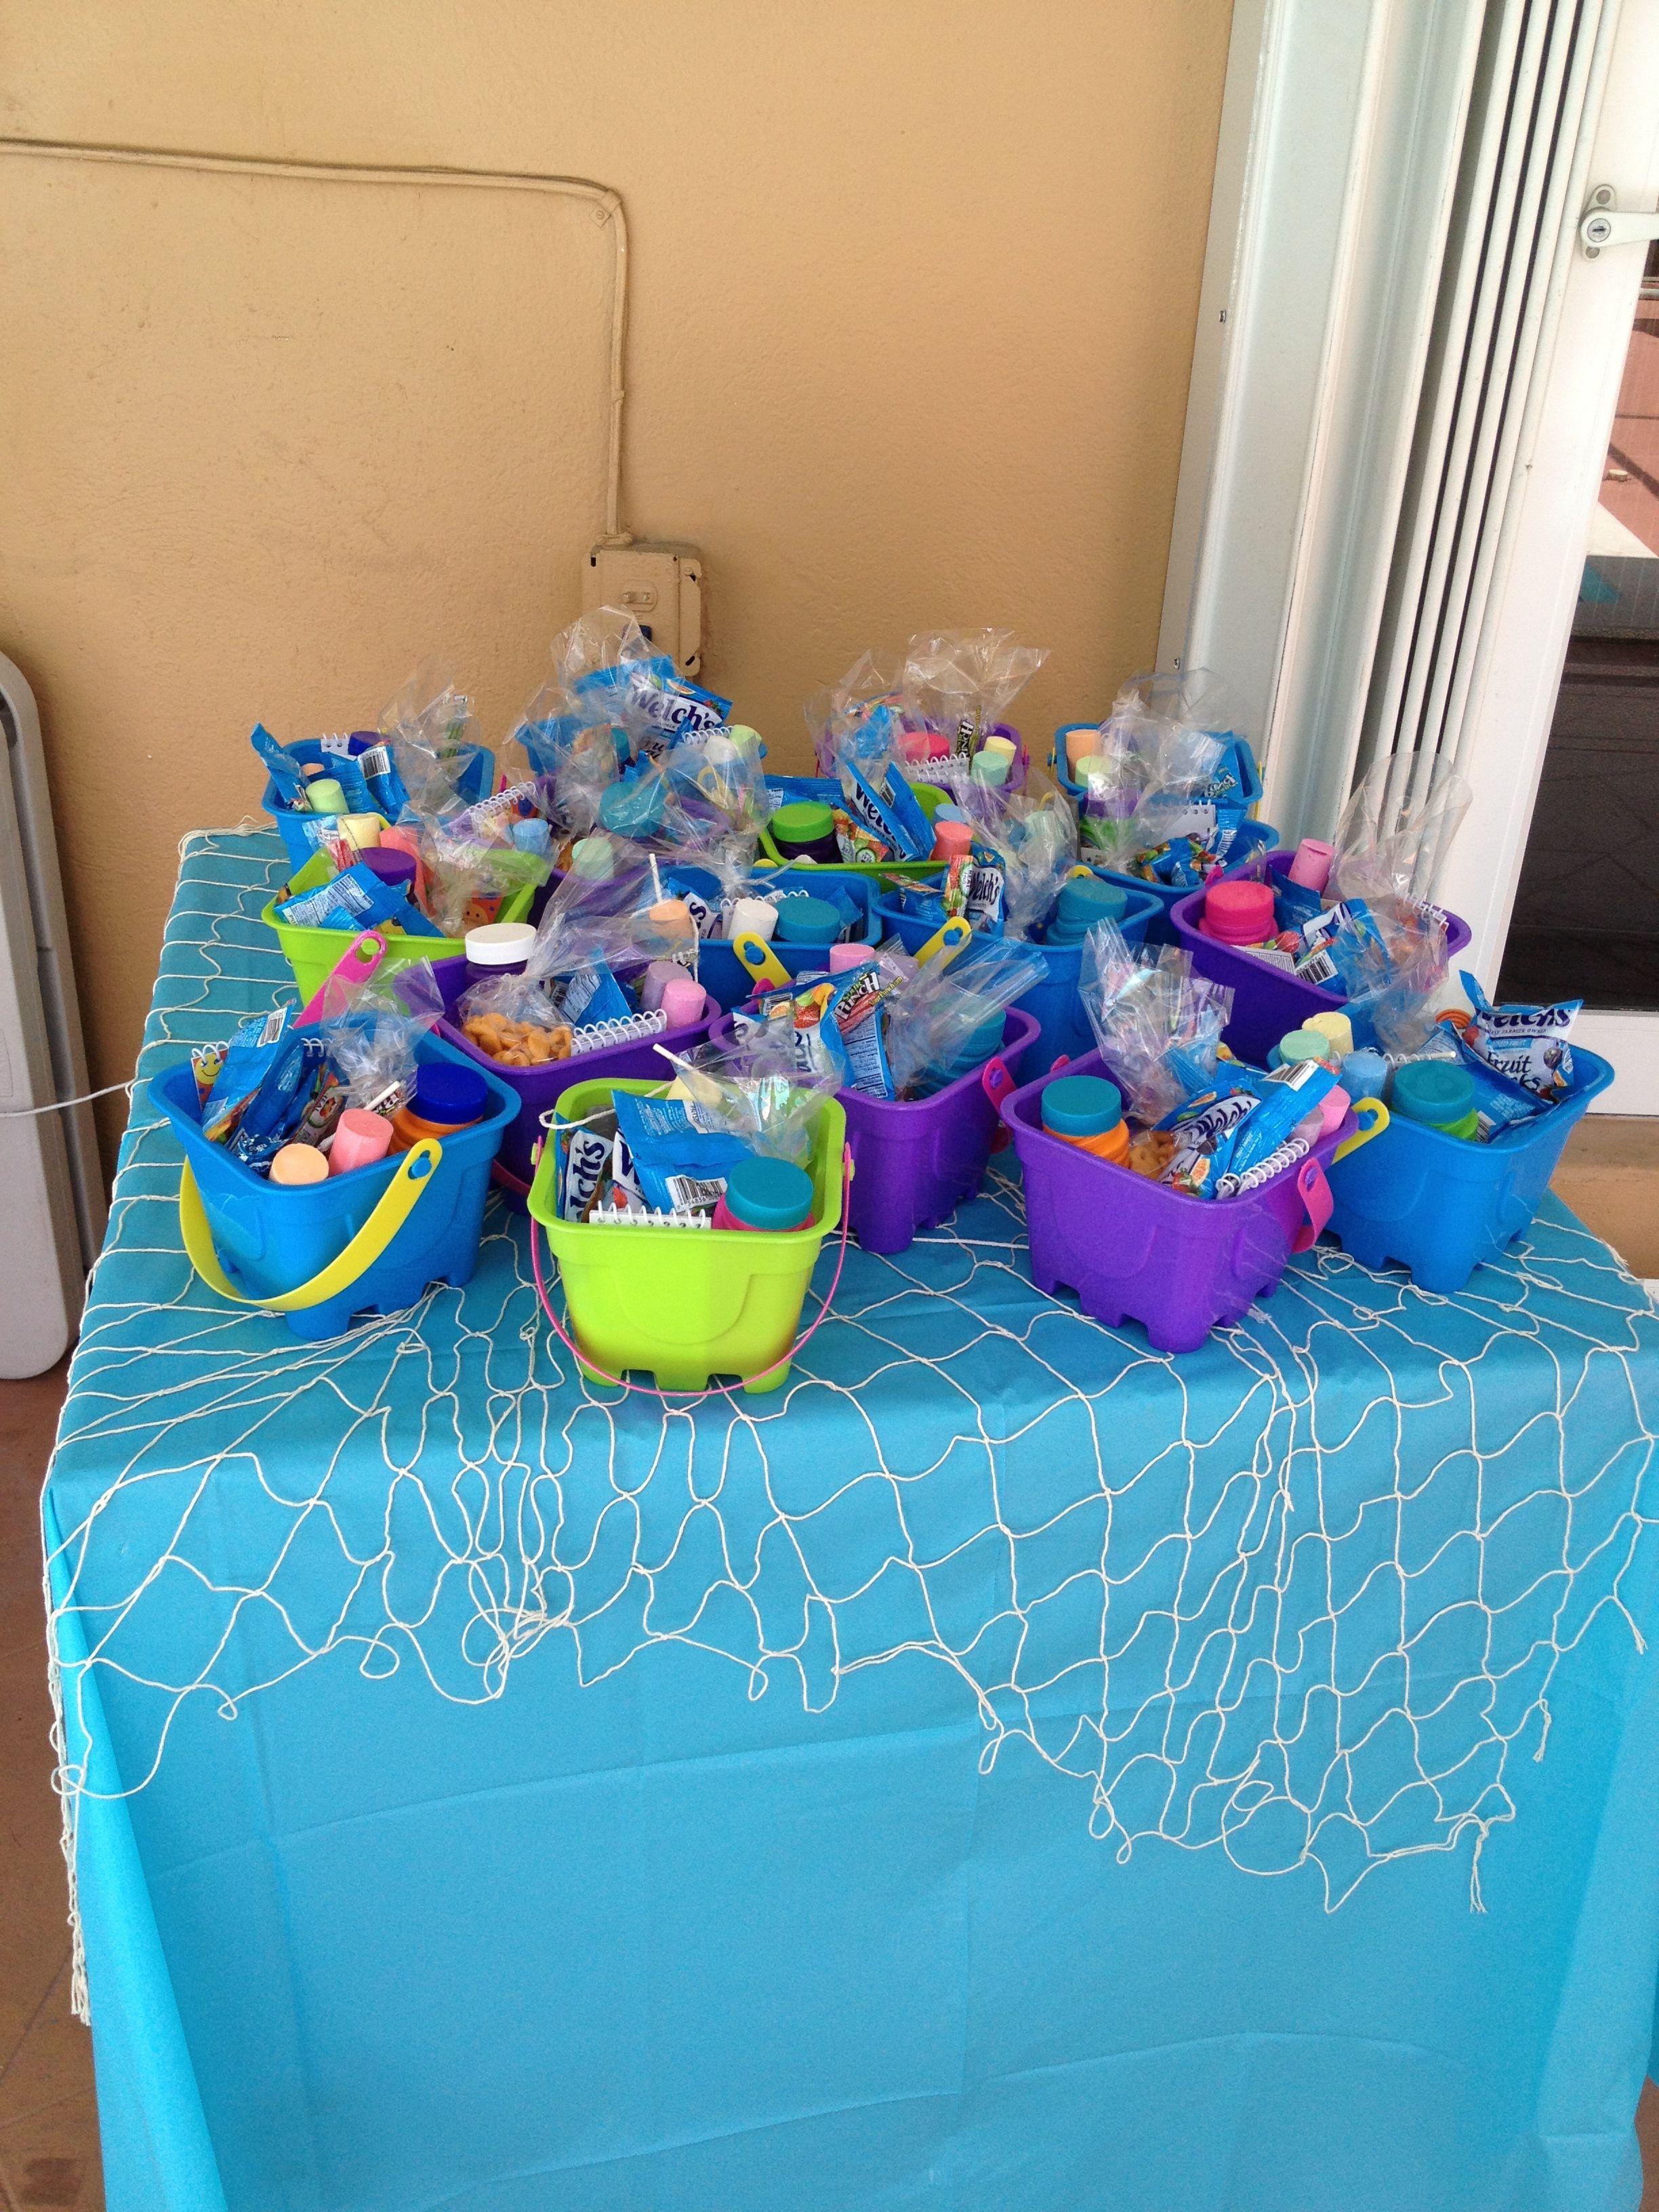 The Little Mermaid Party Ideas Pinterest  Little mermaid party Party ideas